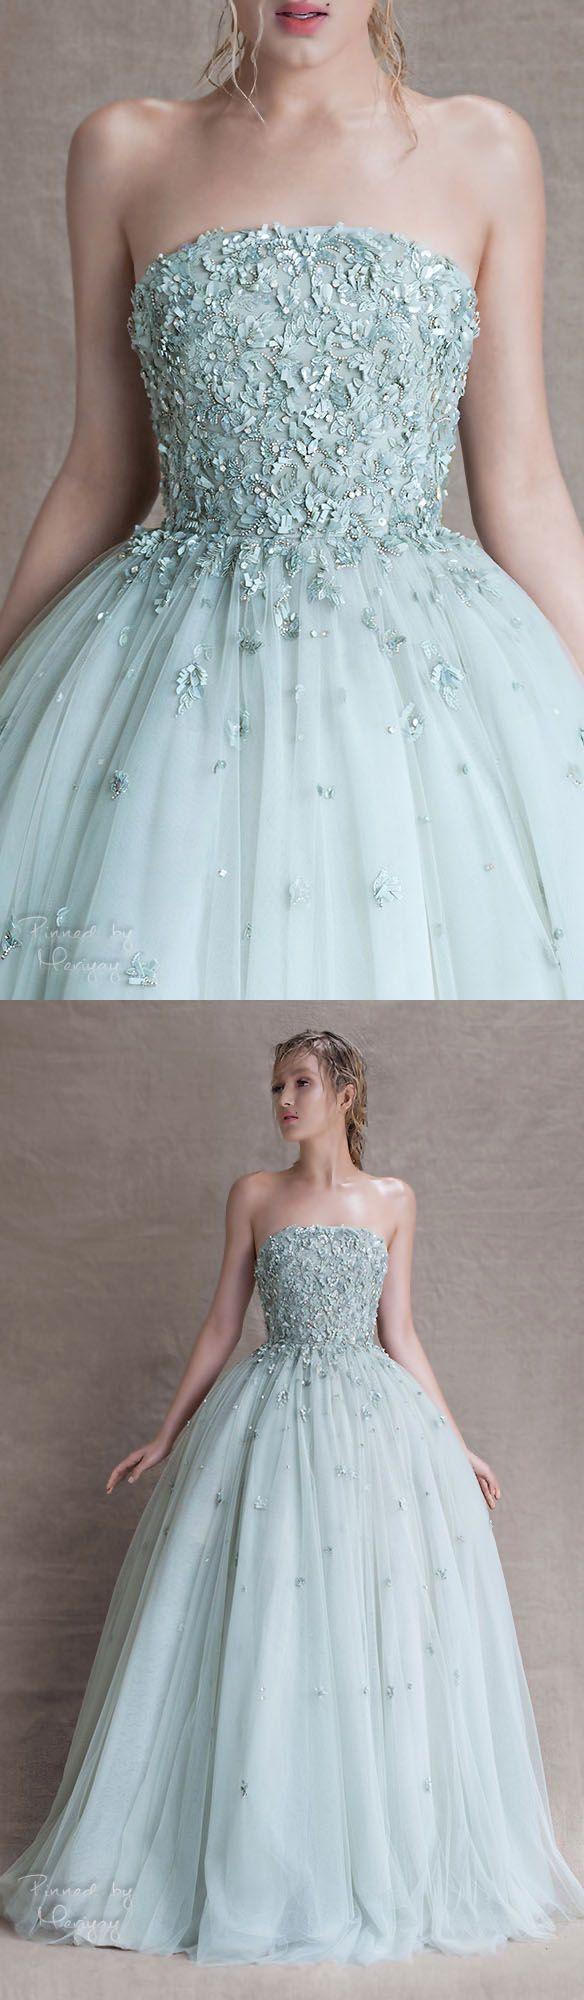 1960 best Beautiful evening dresses images on Pinterest | Party wear ...